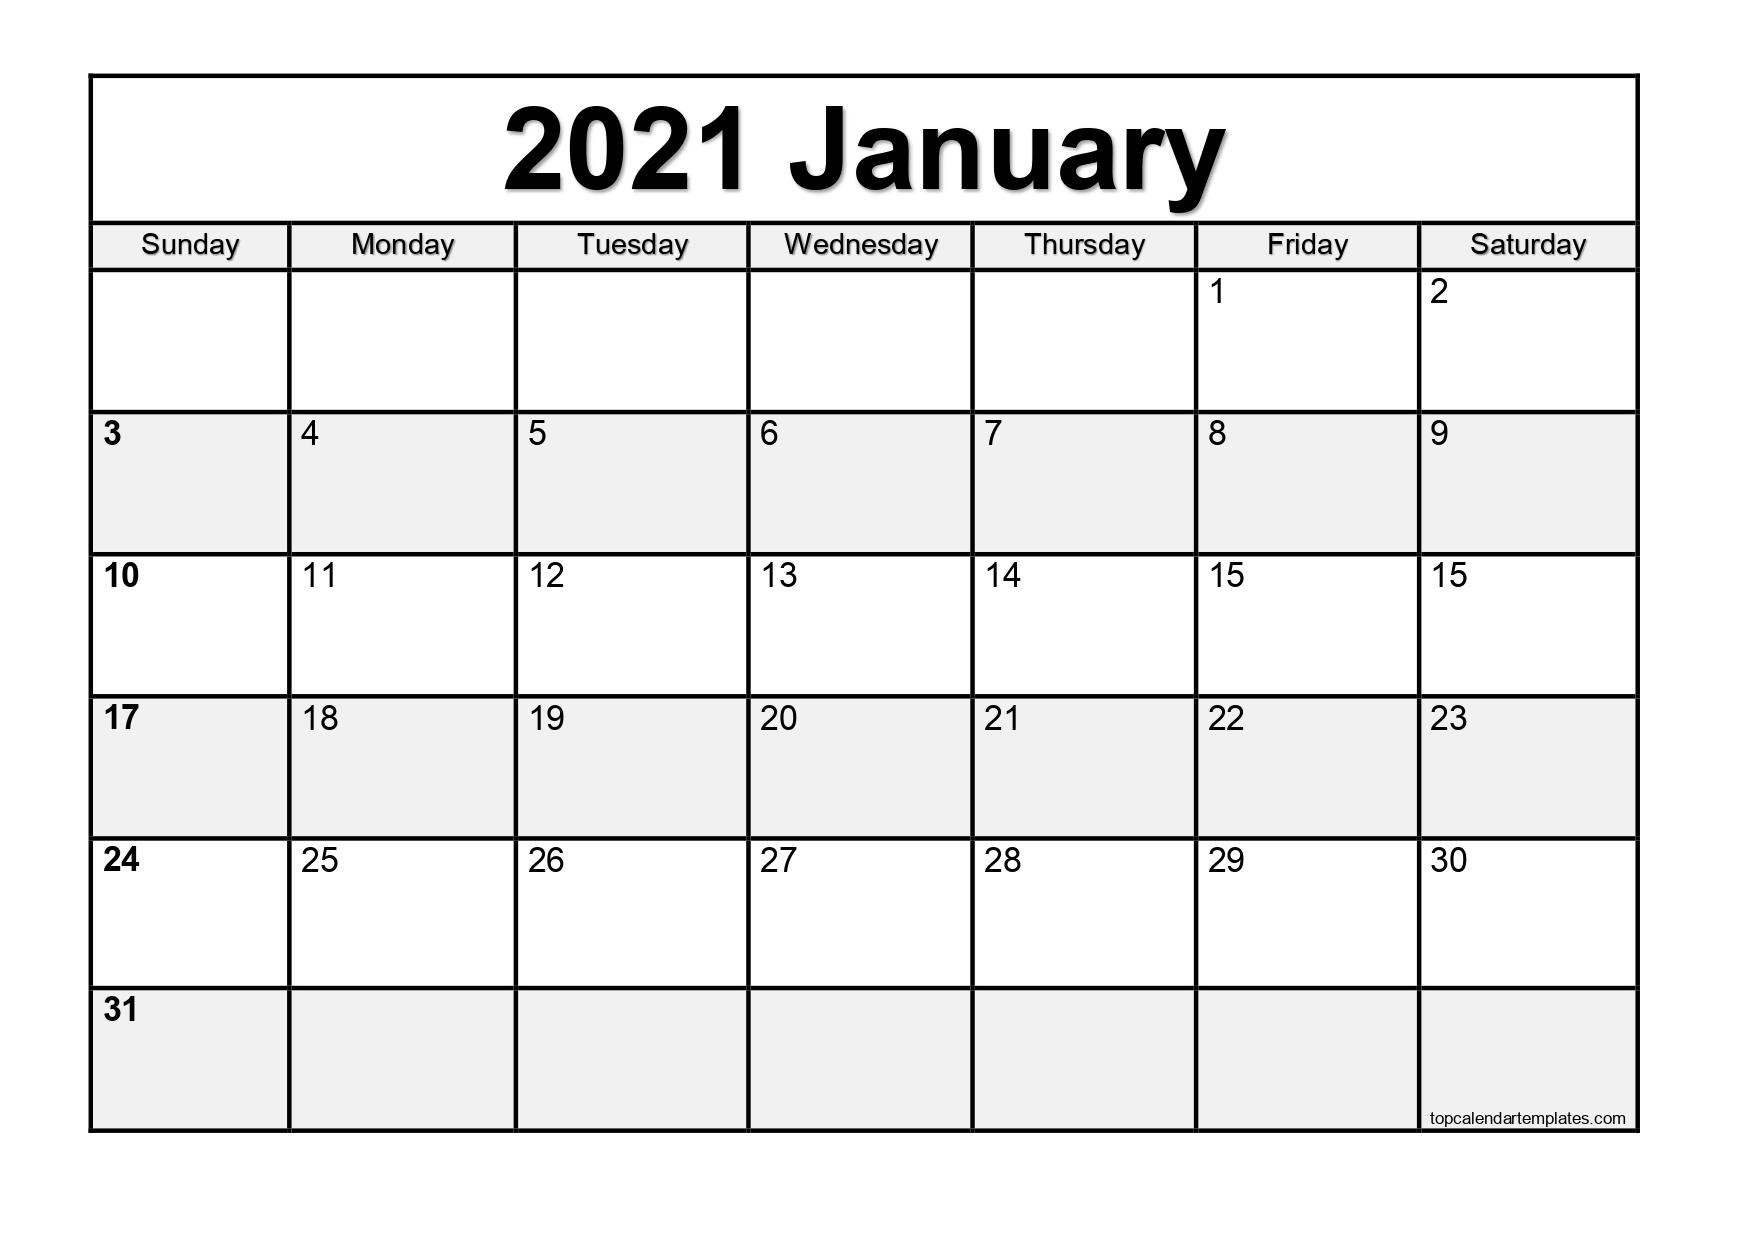 Free January 2021 Calendar Printable Blank Templates 1